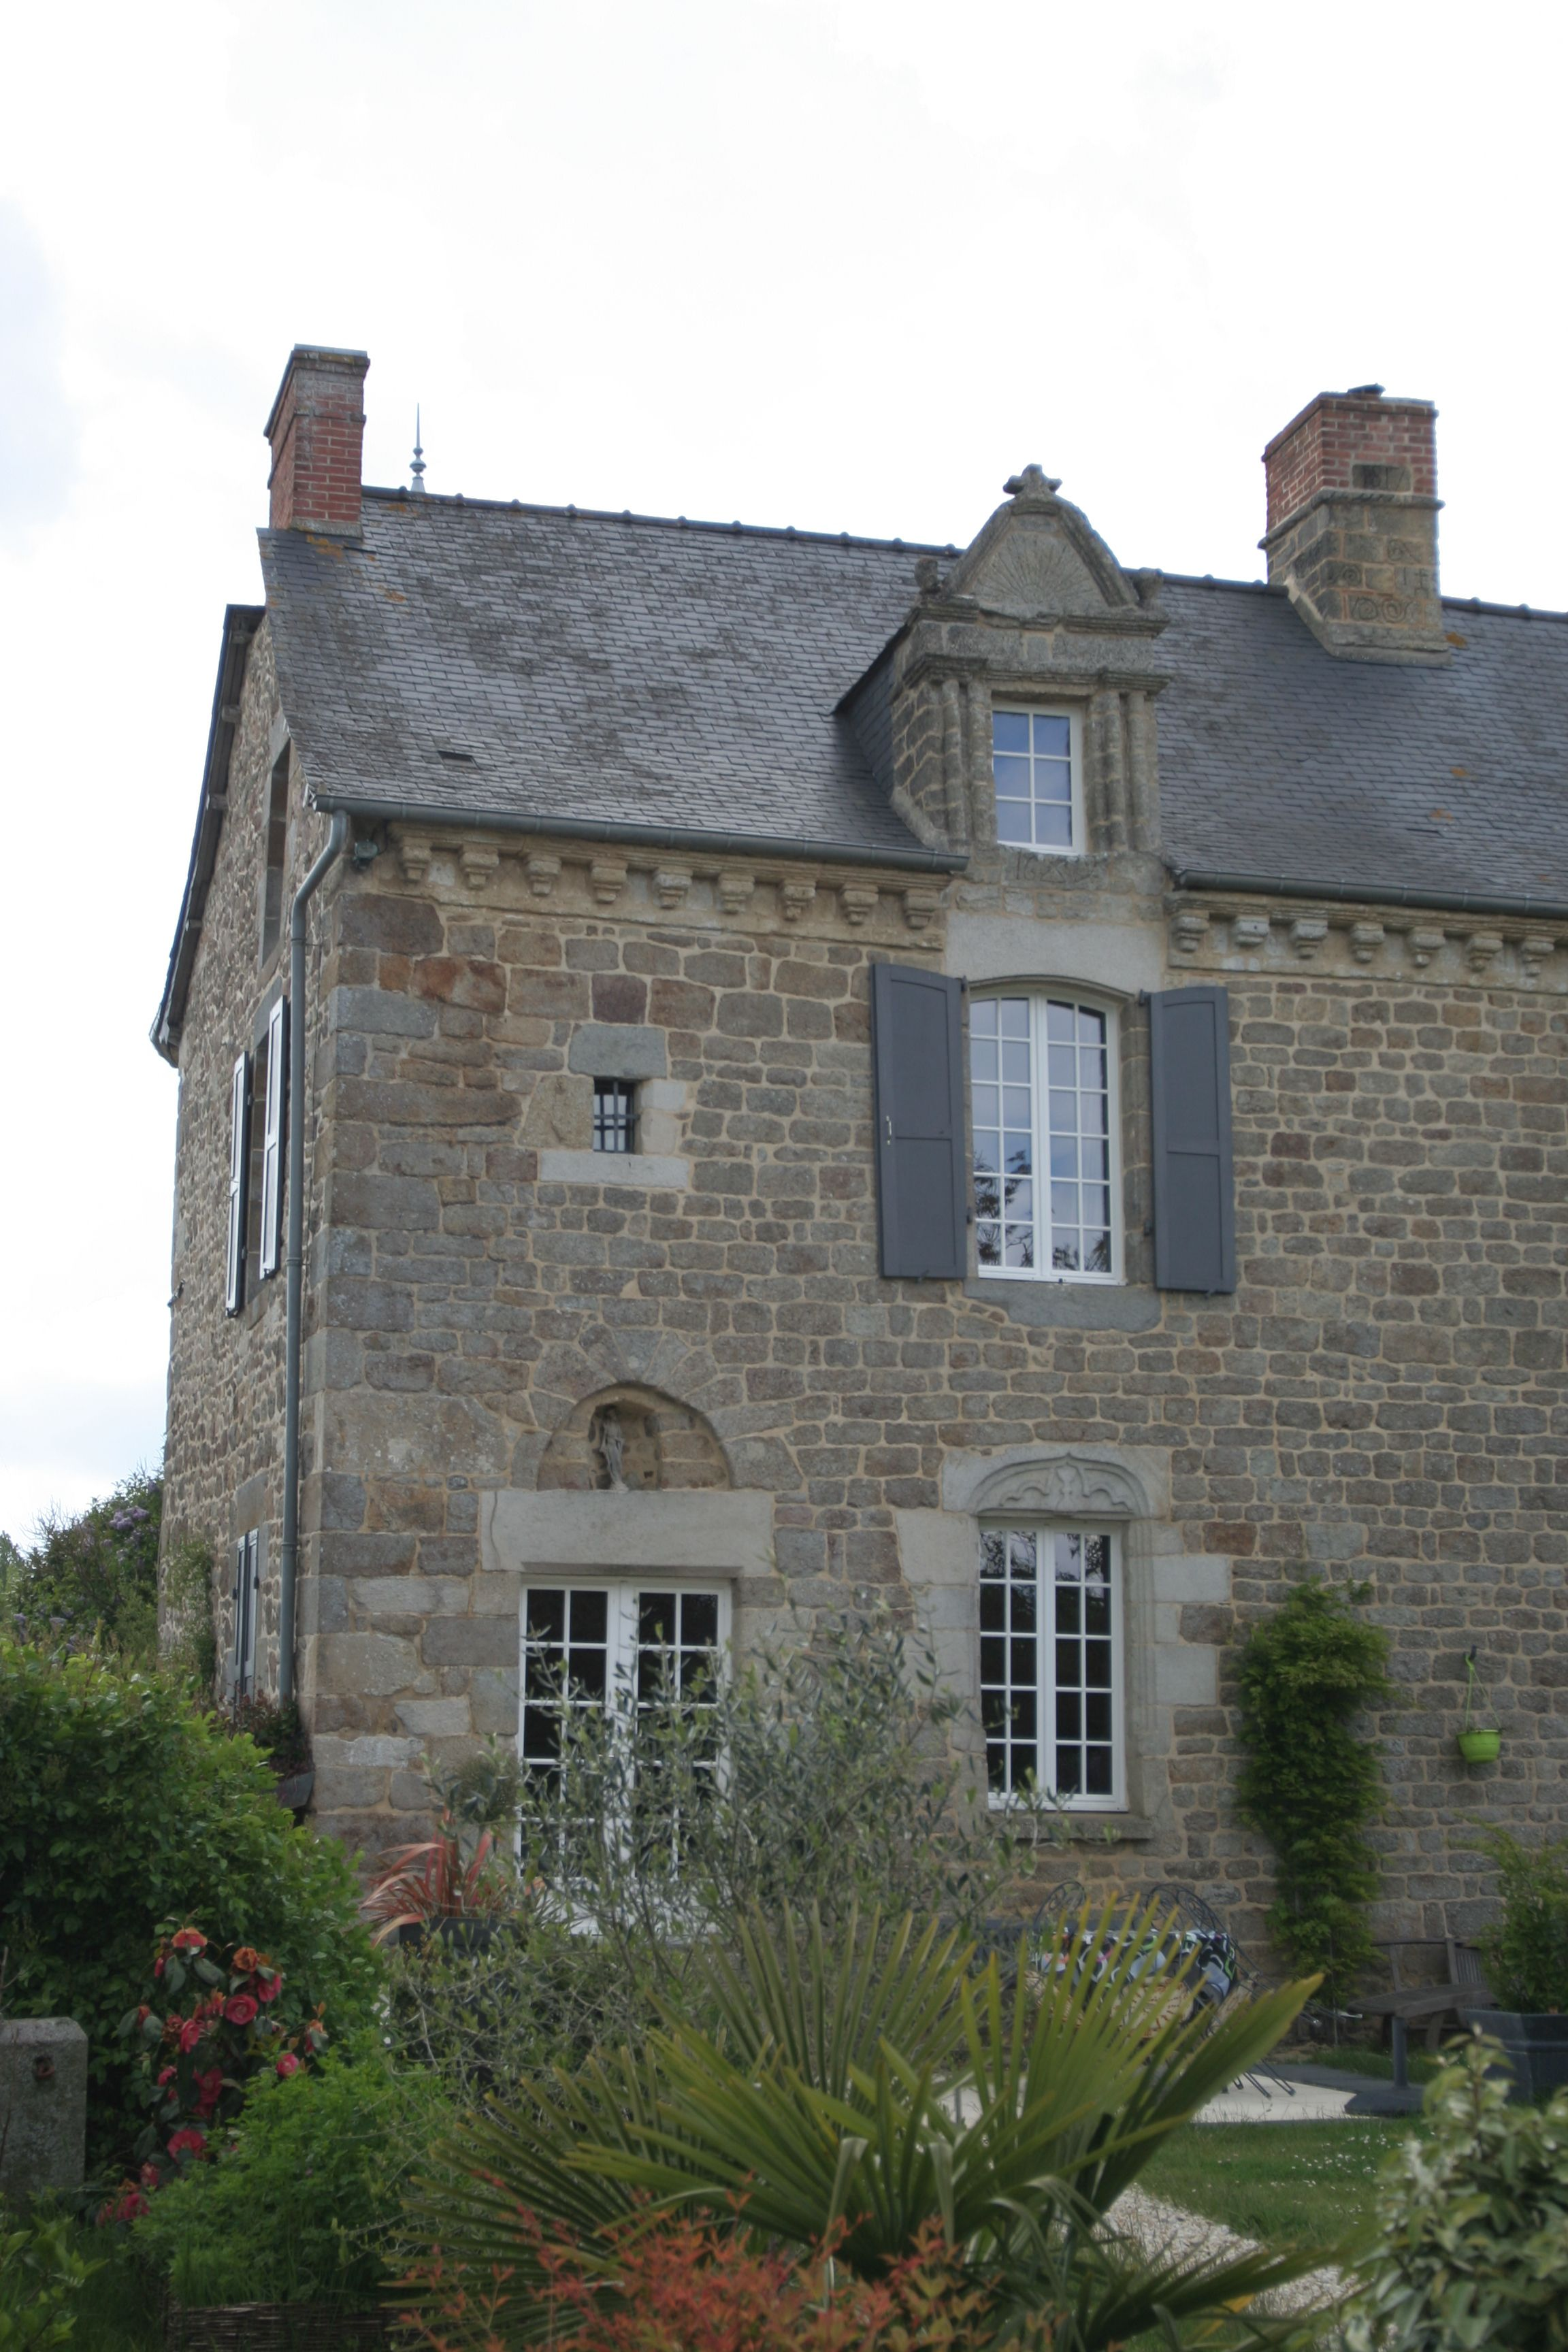 Vacation Rentals in Becherel, France - TripAdvisor